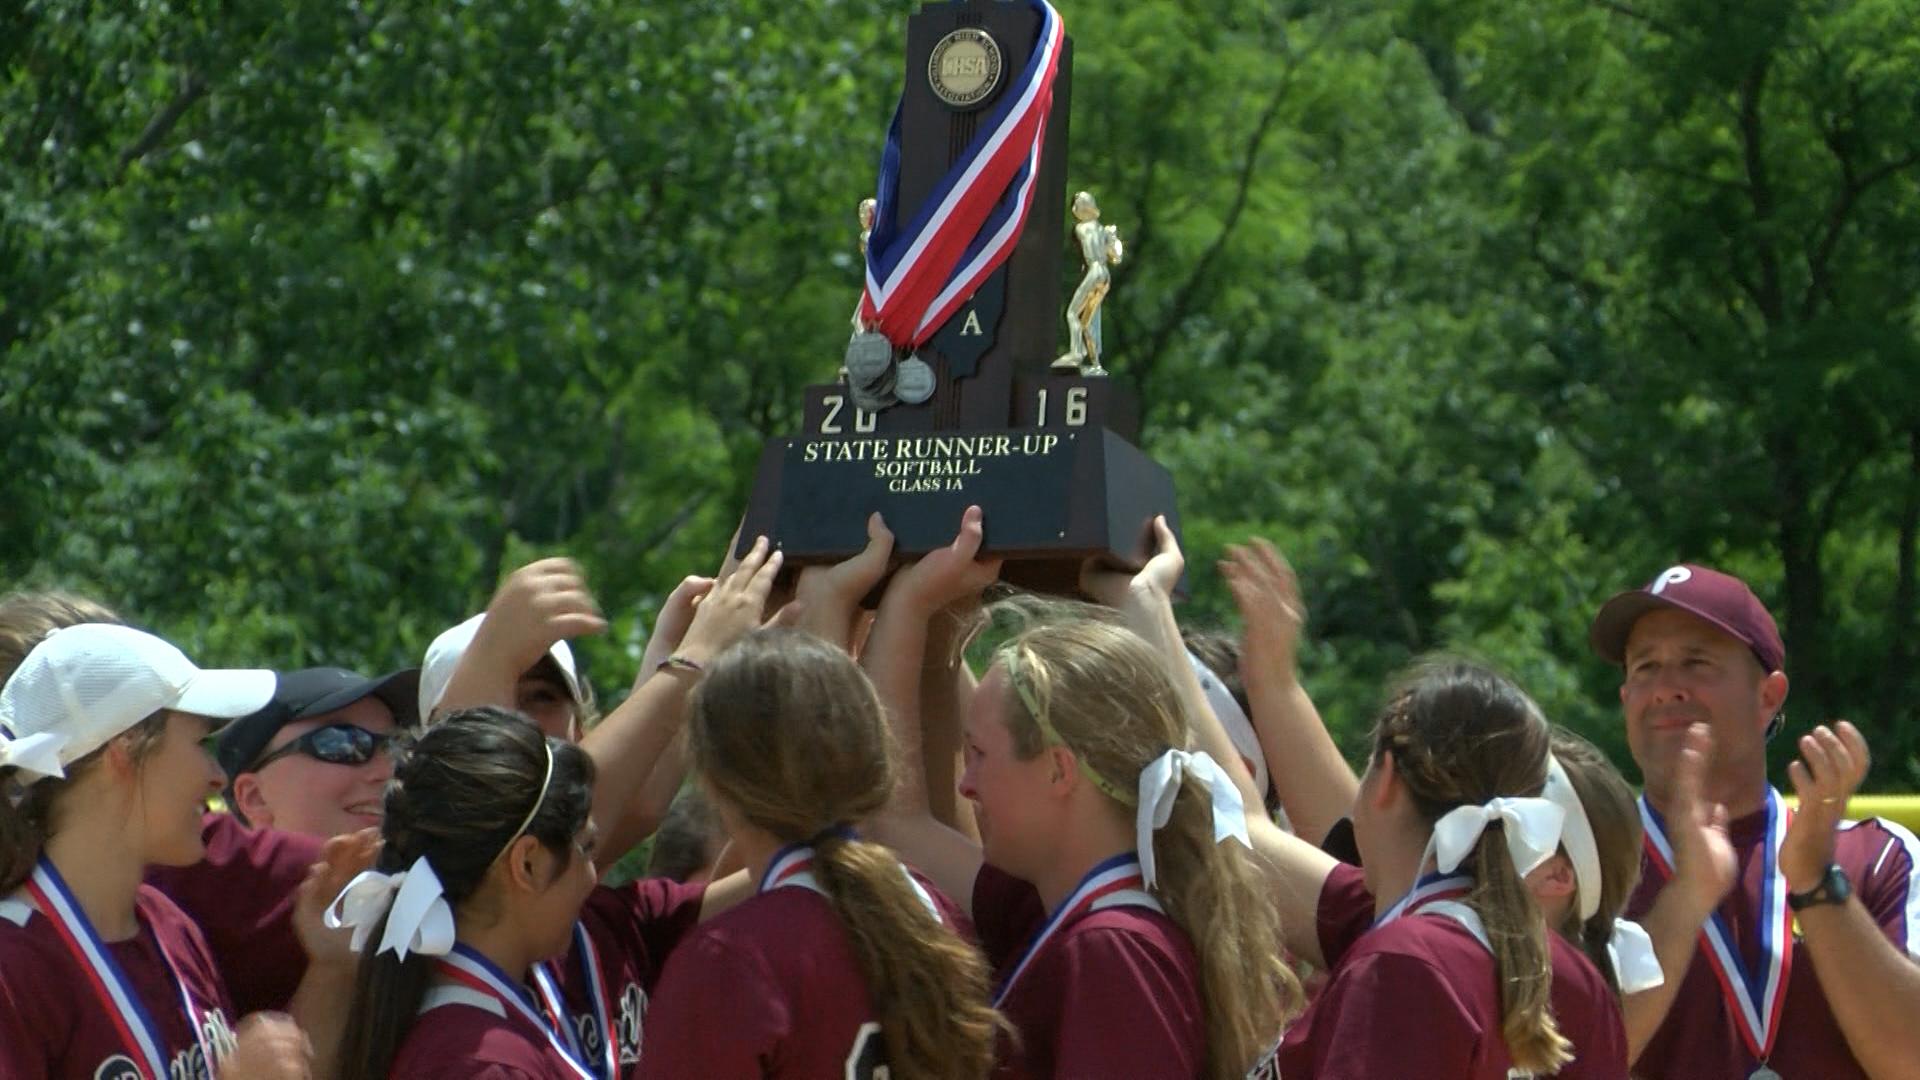 Princeville Softball Runner-up Trophy